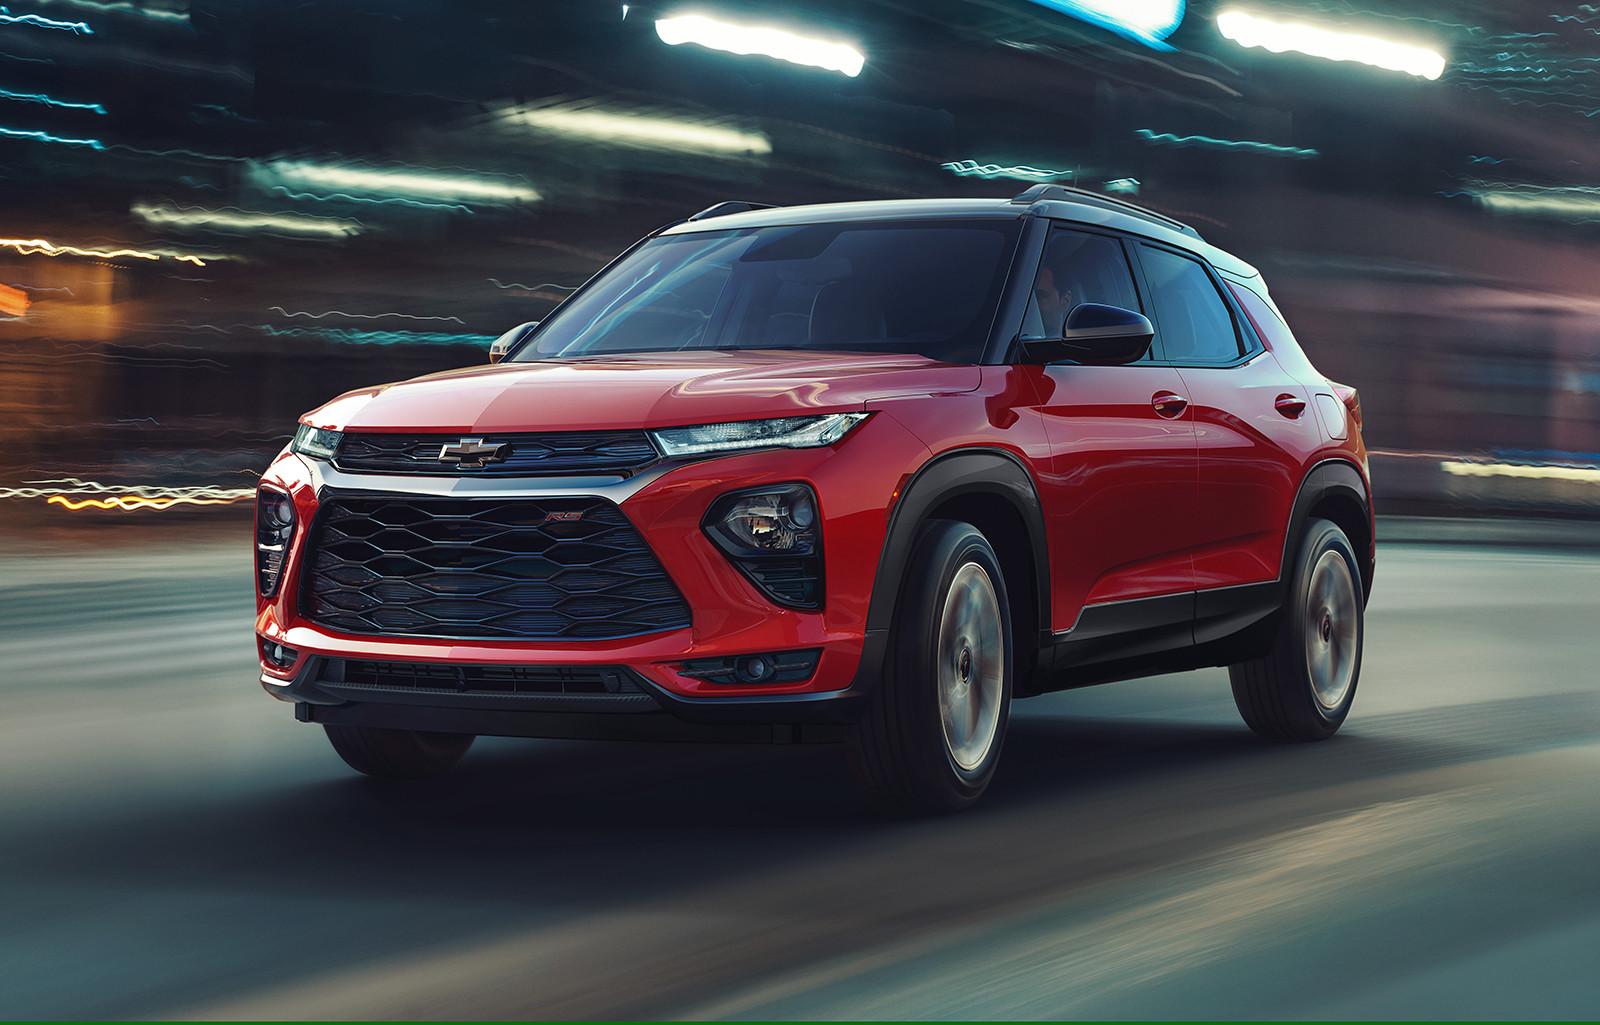 Foto de Chevrolet Trailblazer 2021 (20/26)